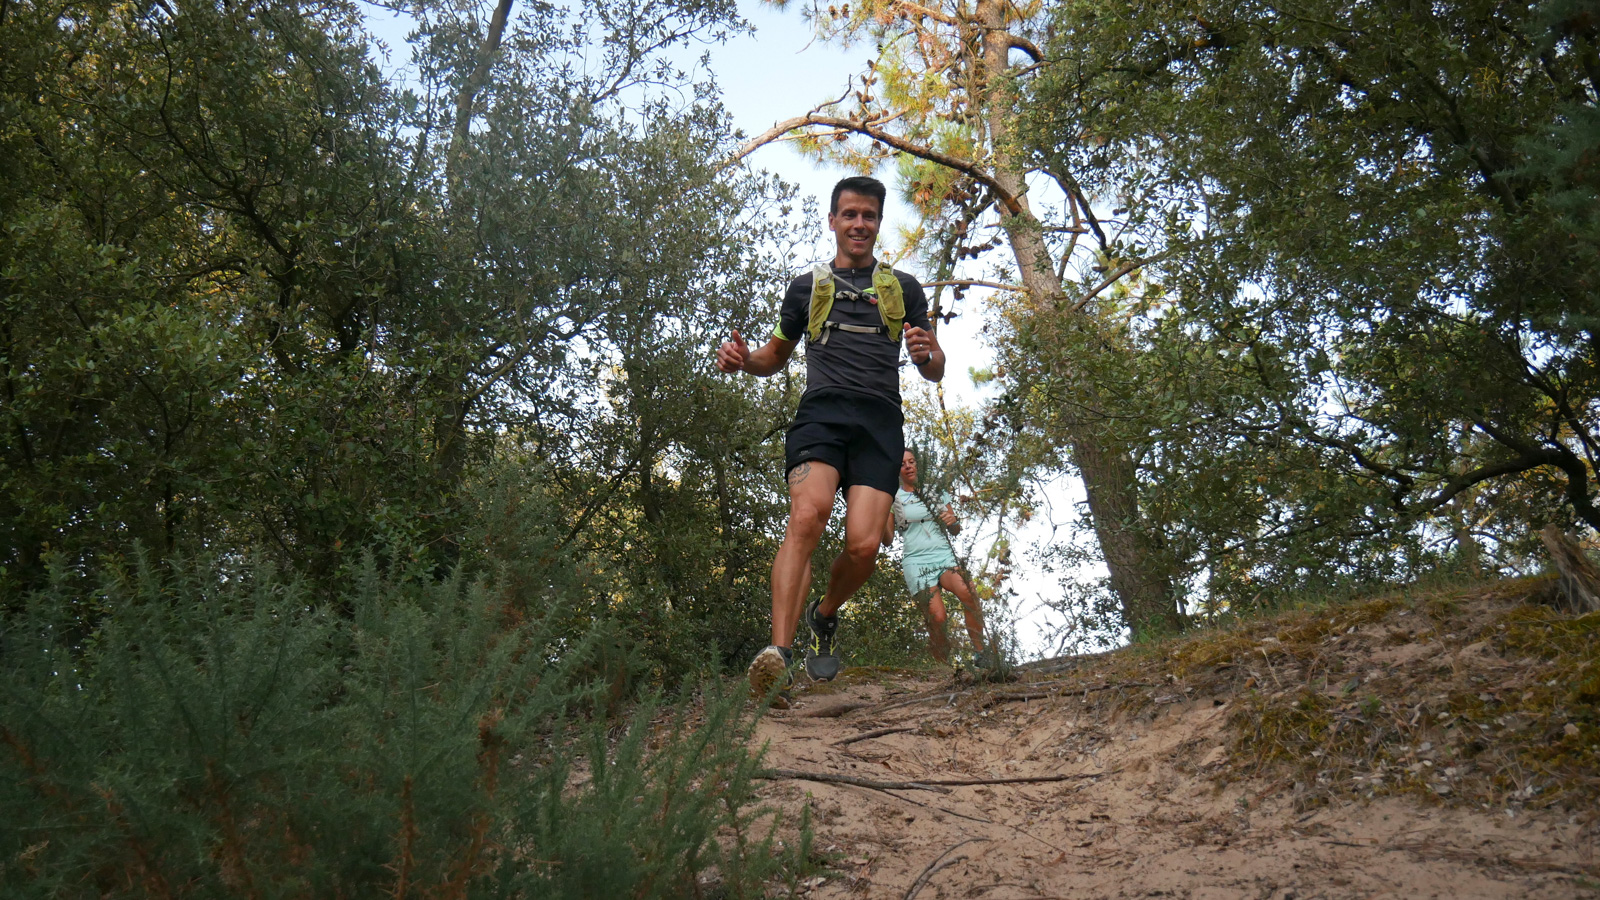 activites-sport-nature-Trail-vendee-antoine-bidet-course-foret1